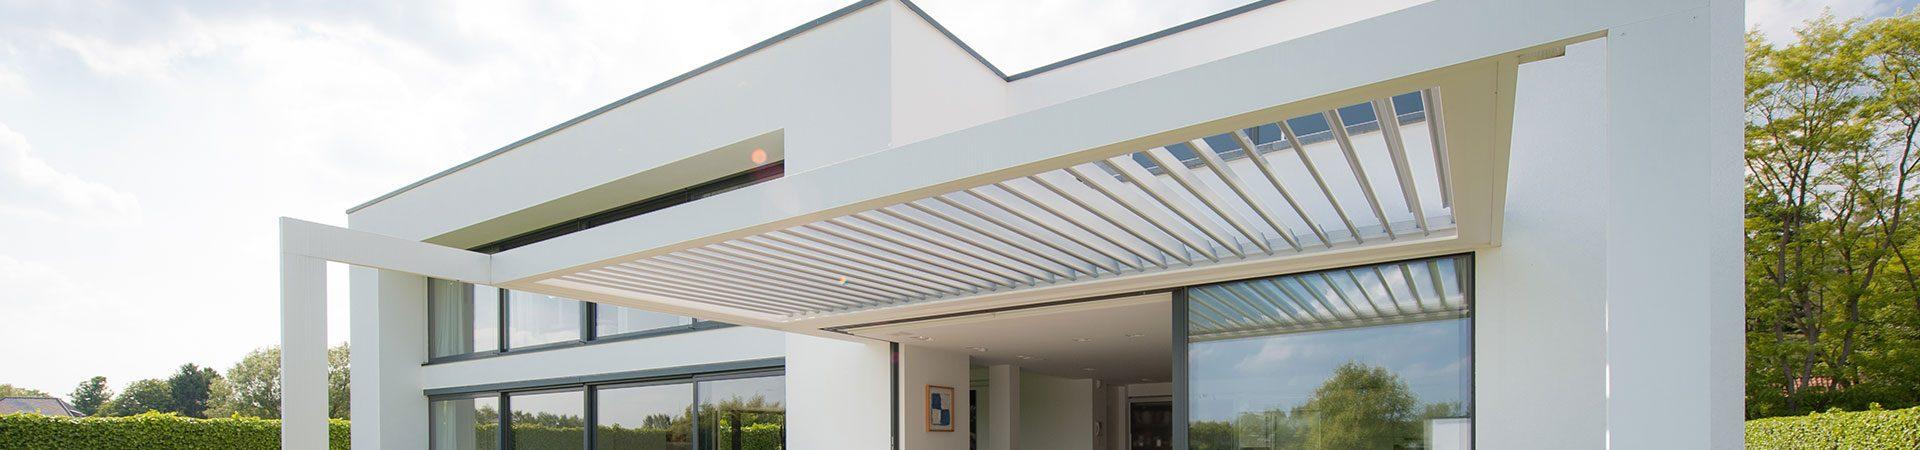 Louvretec Opening Roof